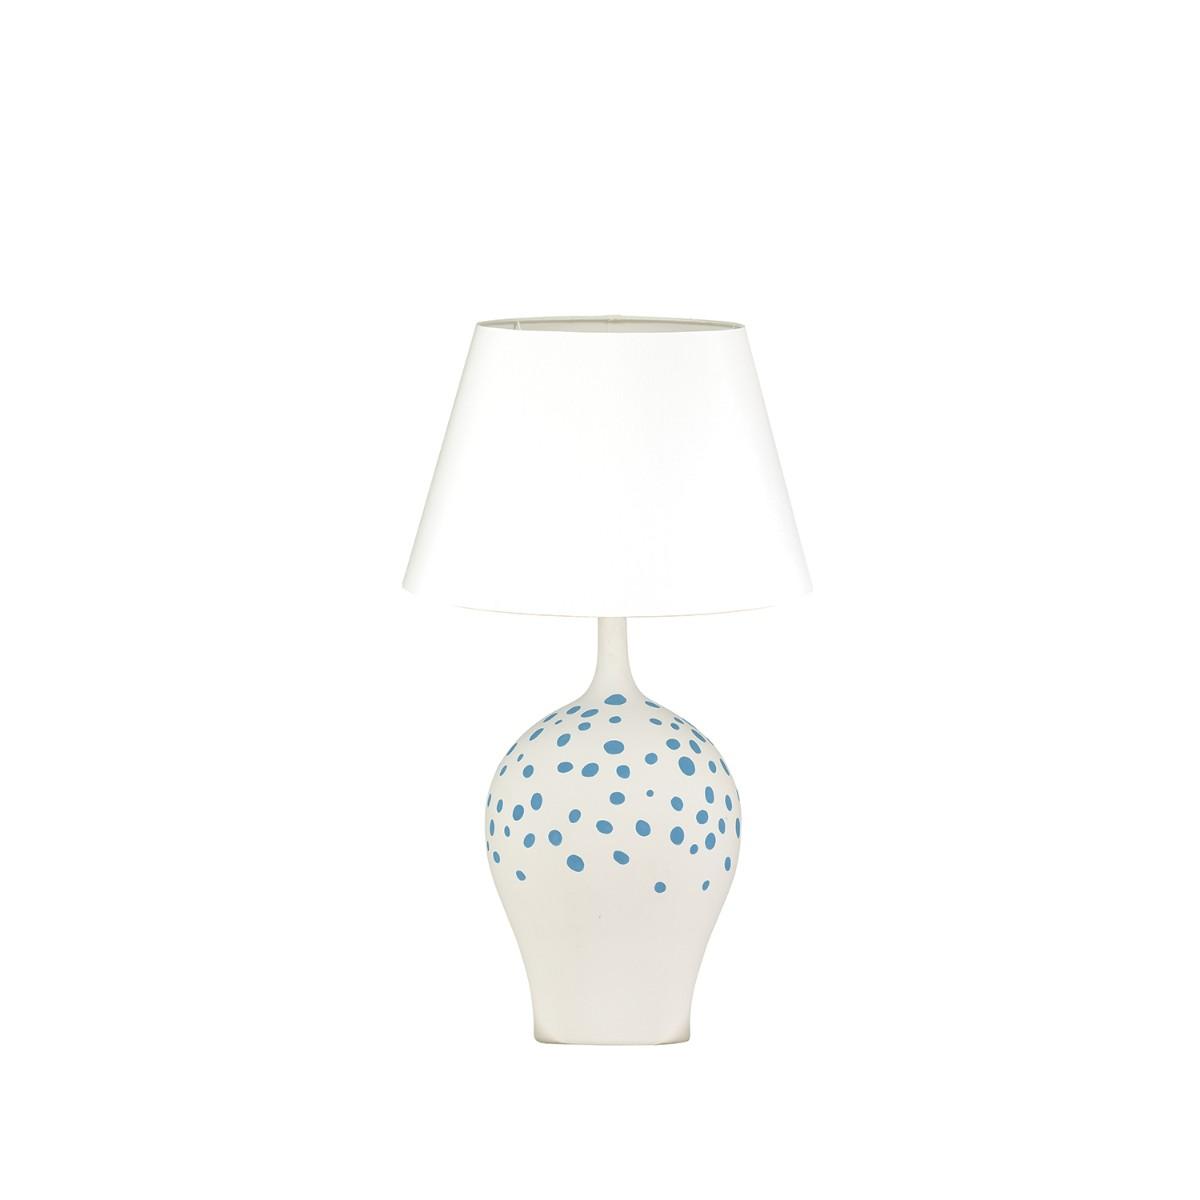 William Yeoward | Angelica Table Lamp | Peacock